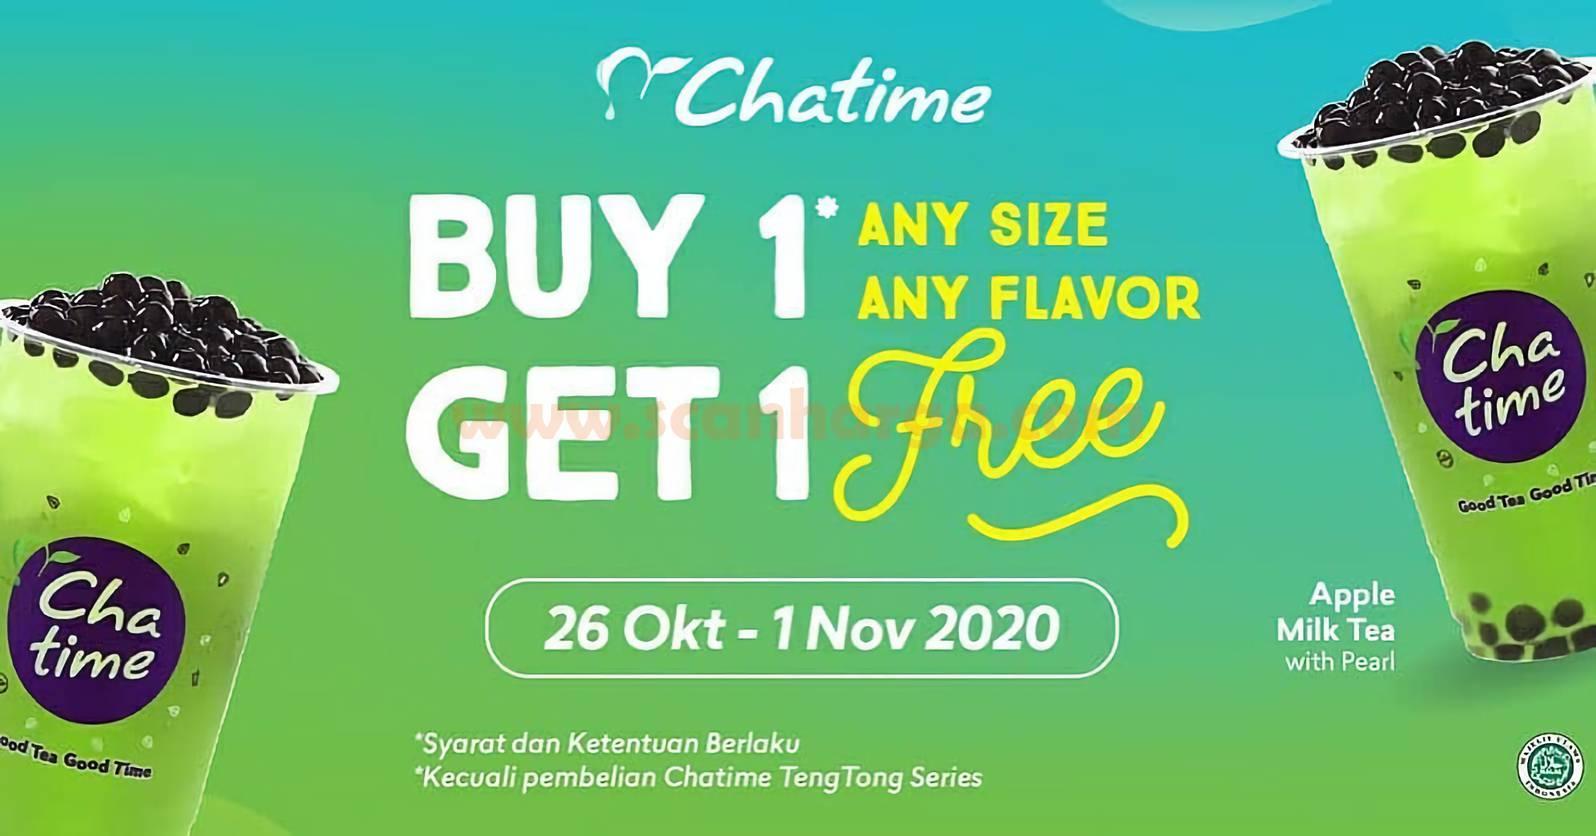 Promo Chatime Buy 1 Get 1 [GRATIS Apple Greentea]*